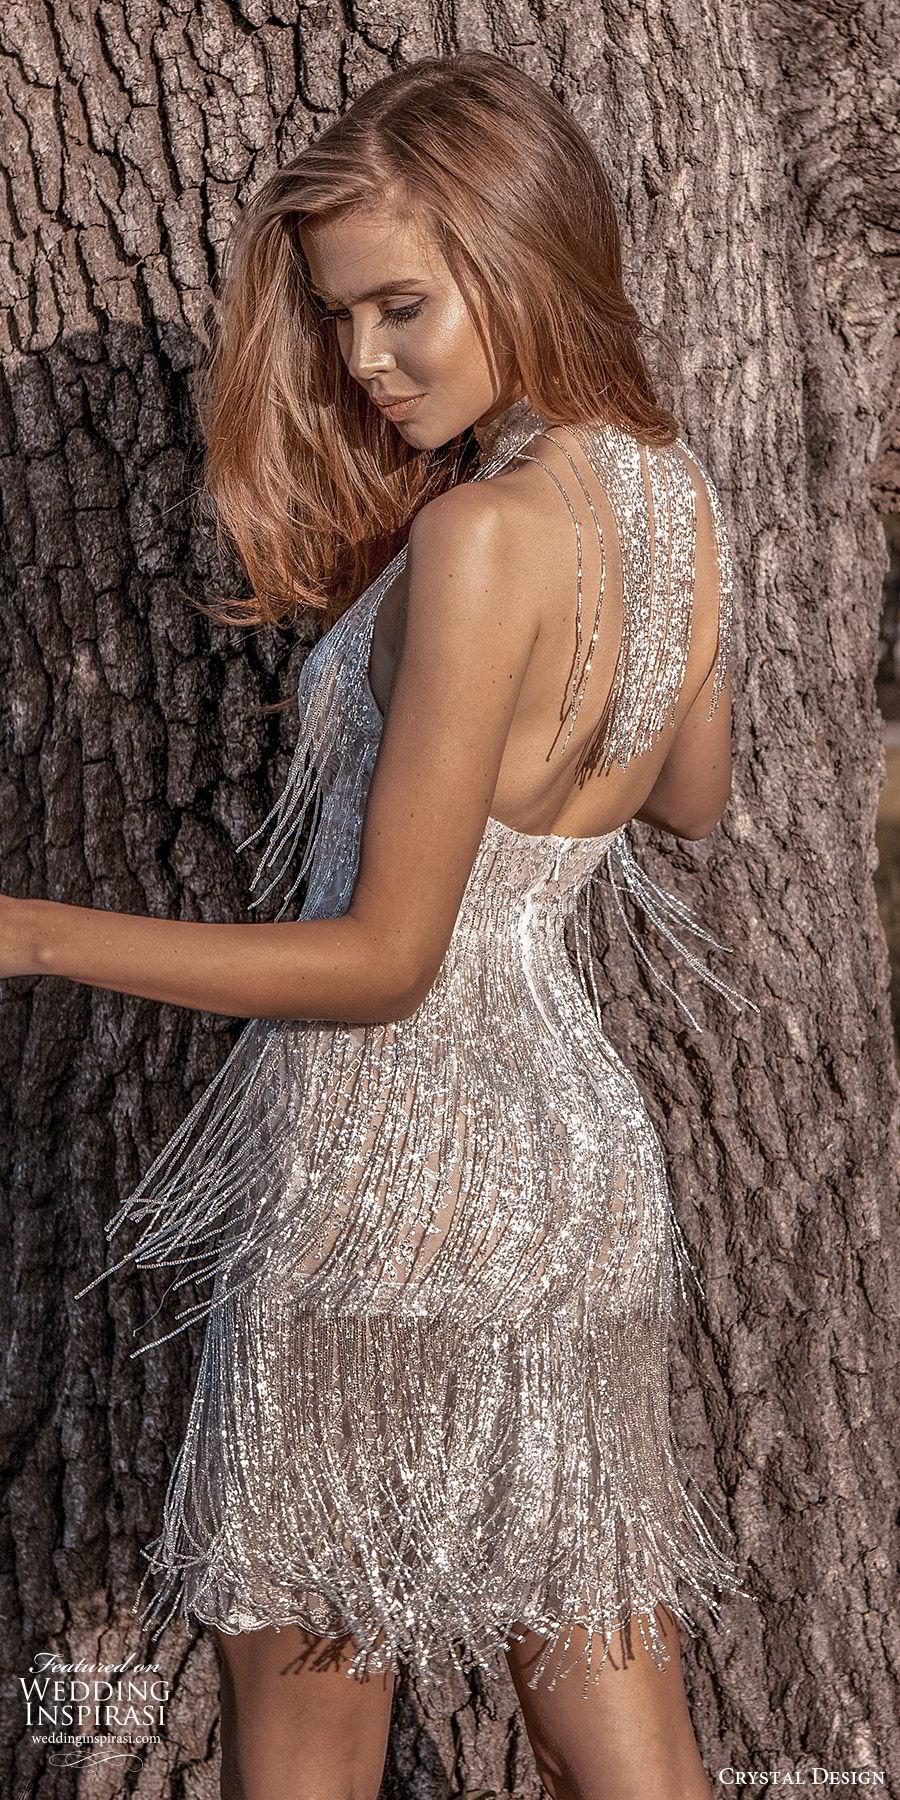 crystal design 2020 couture bridal sleeveless halter neckline short mini wedding dress (10) beaded fringe glitzy glam bv